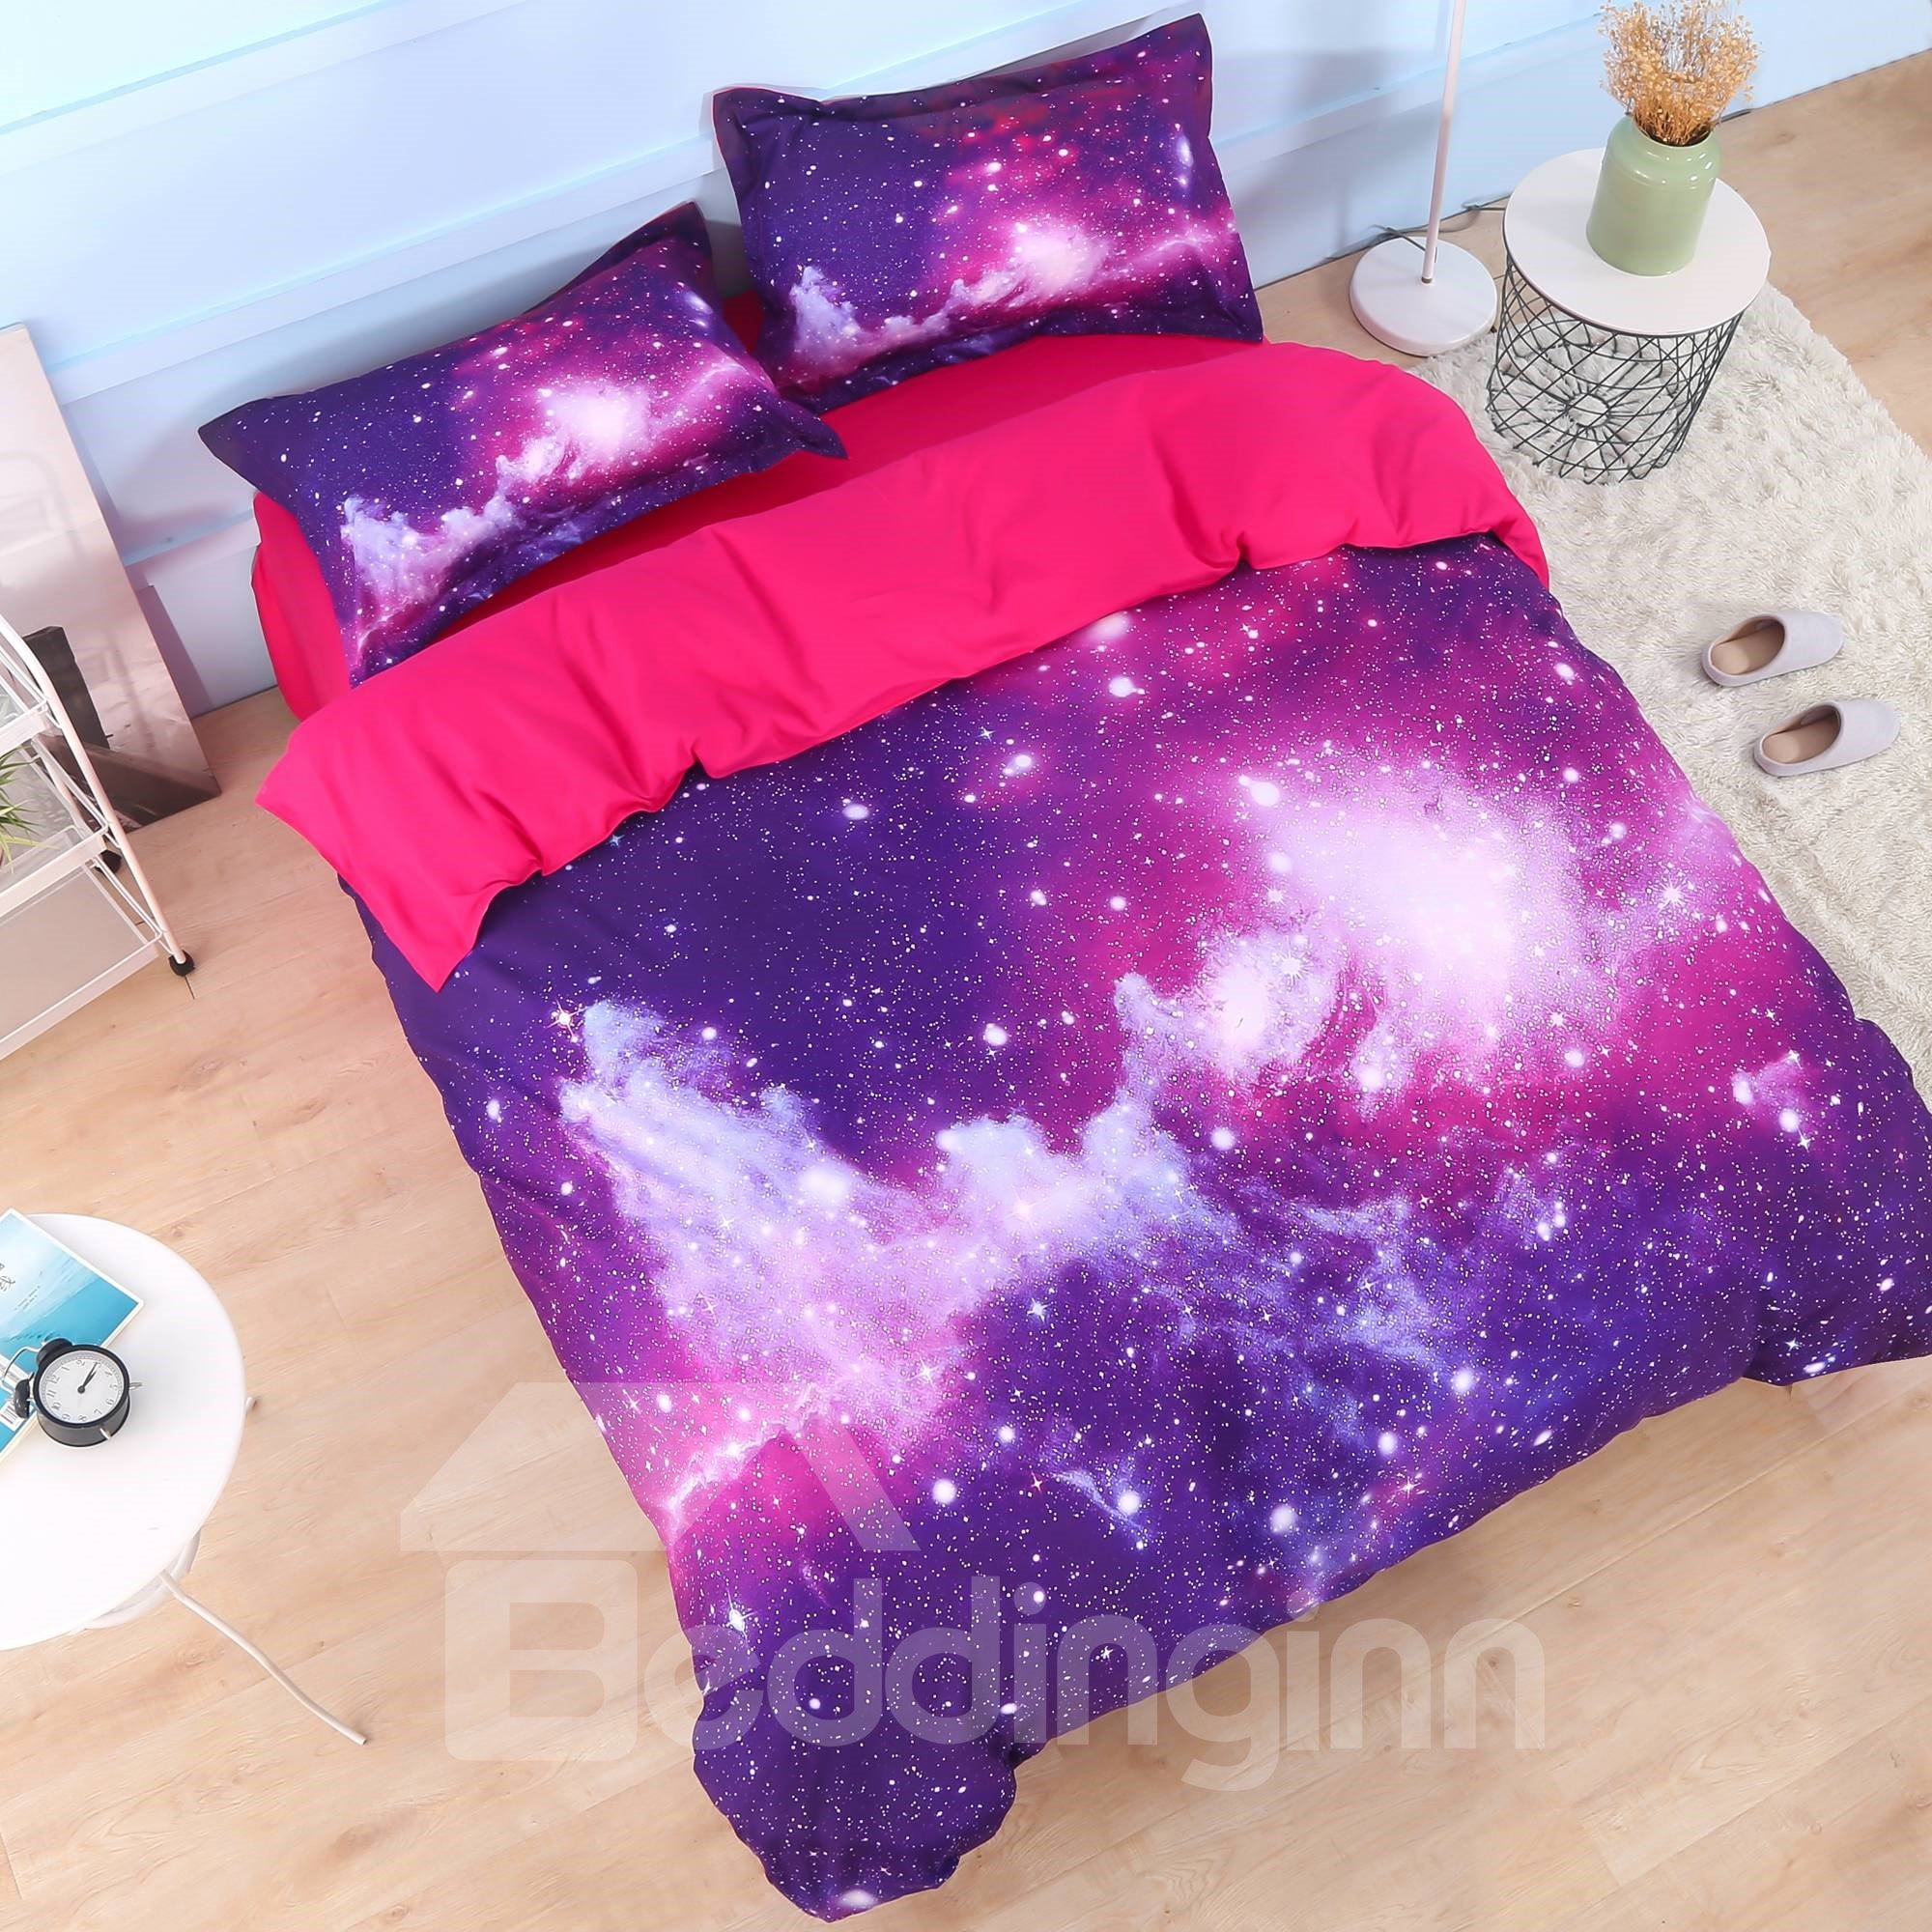 Galaxy Cluster Printed Cotton 4Piece 3D Purple Bedding